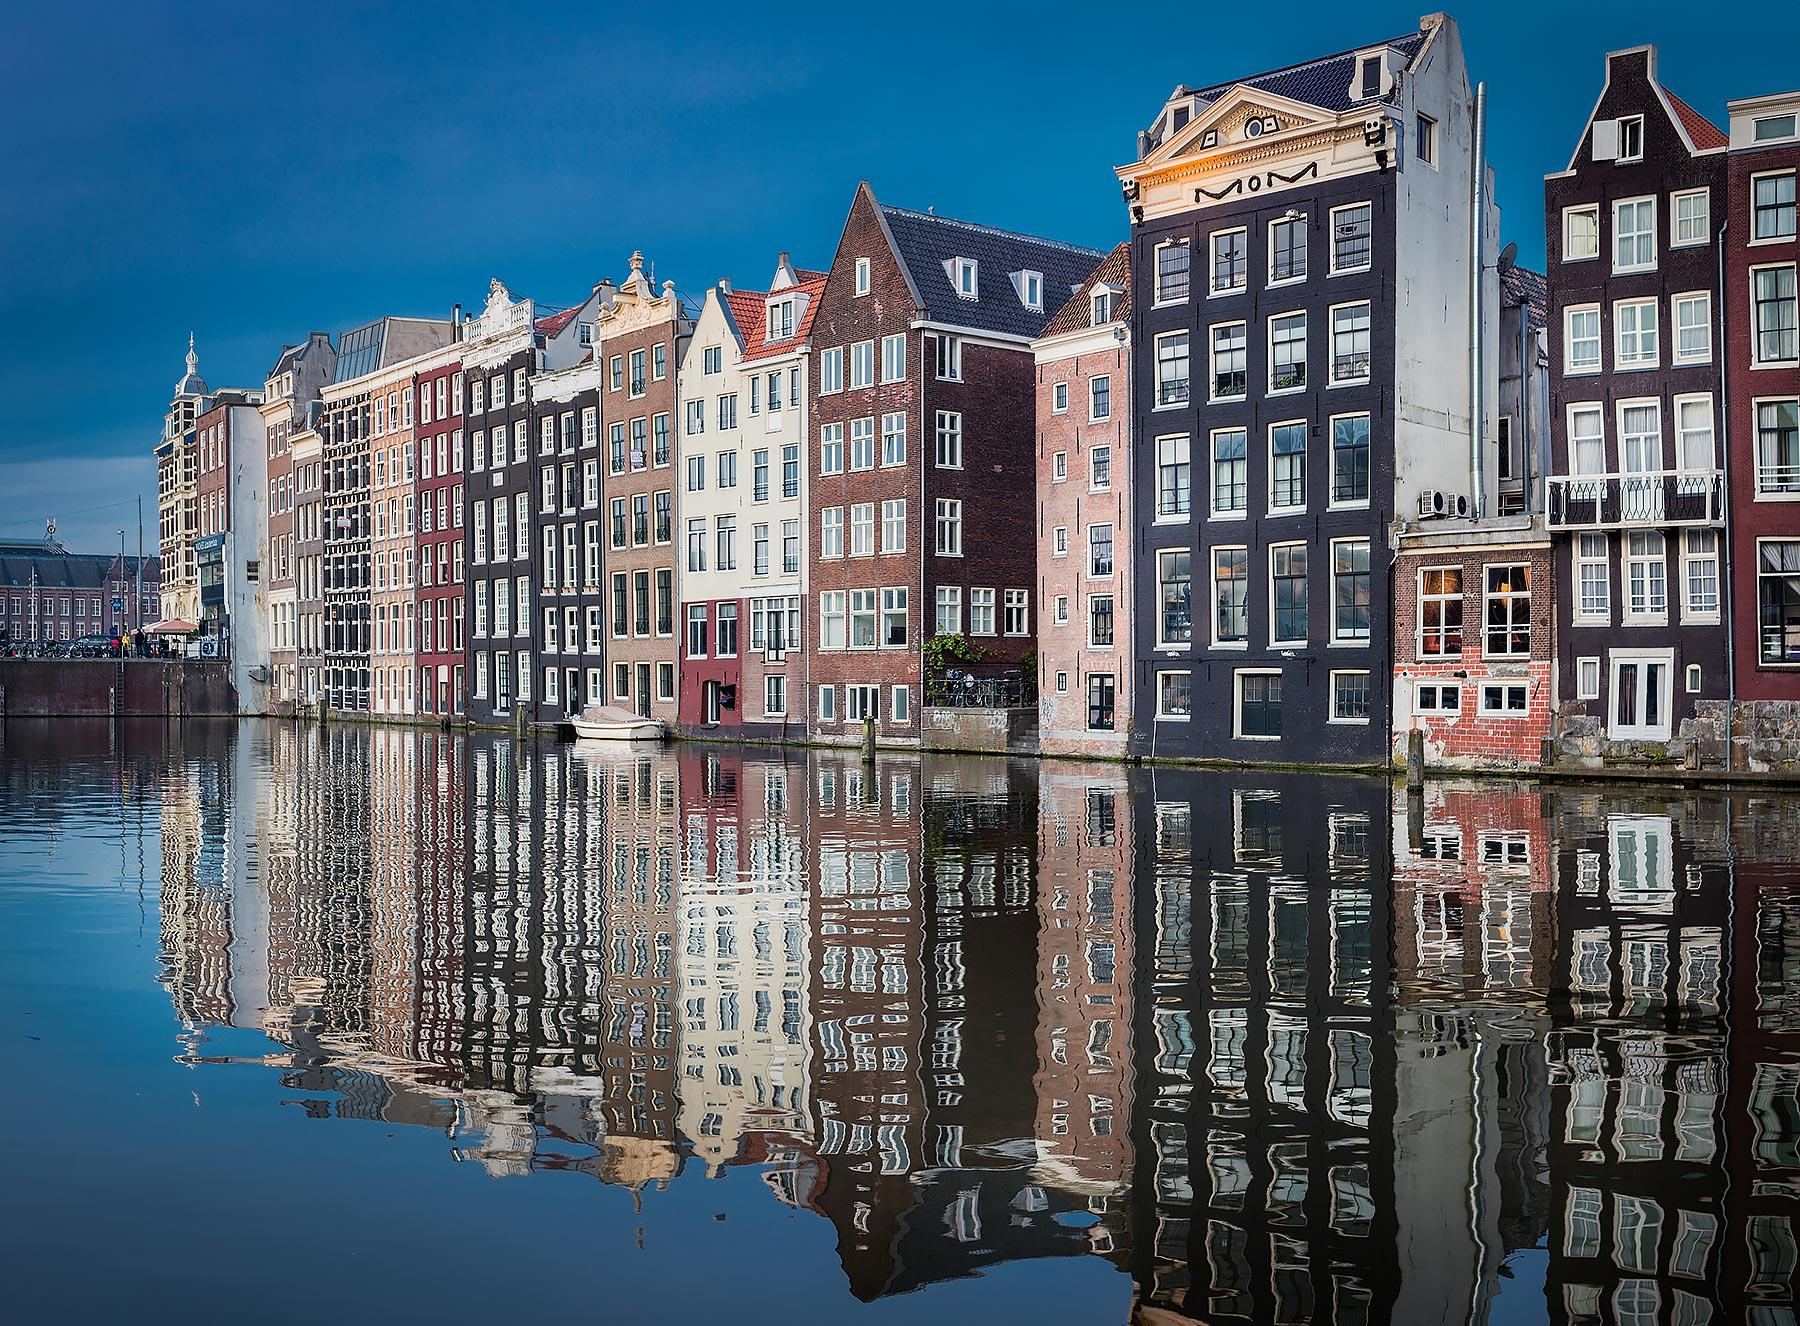 amsterdamhouses.jpg